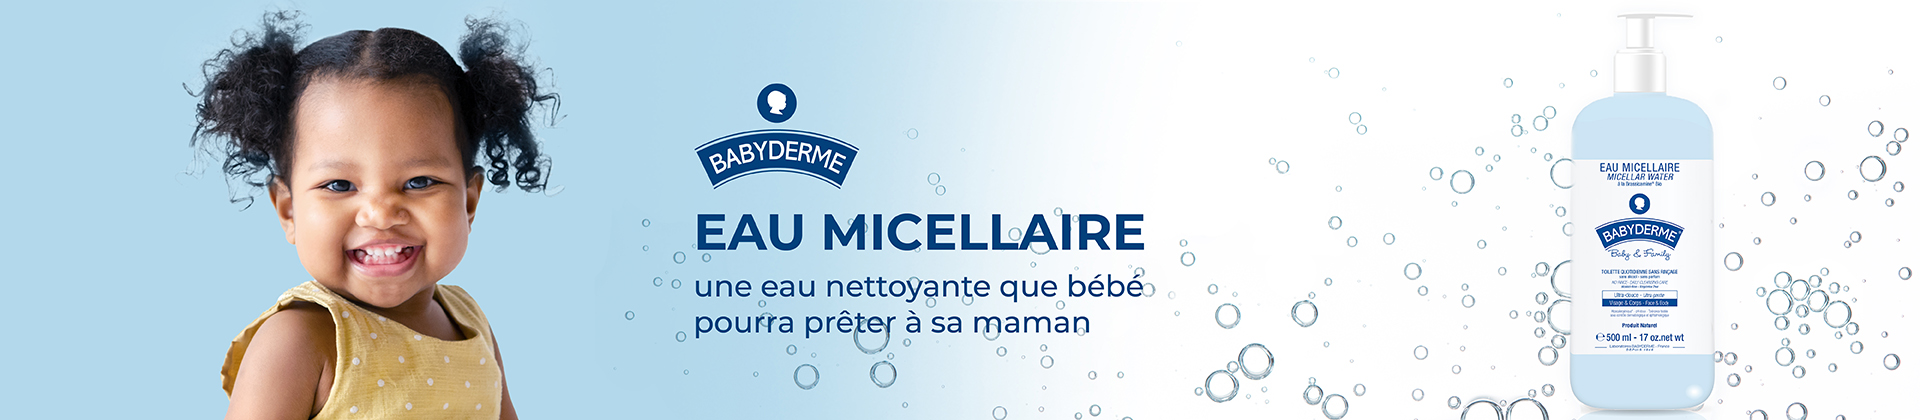 header eau micellaire babyderme